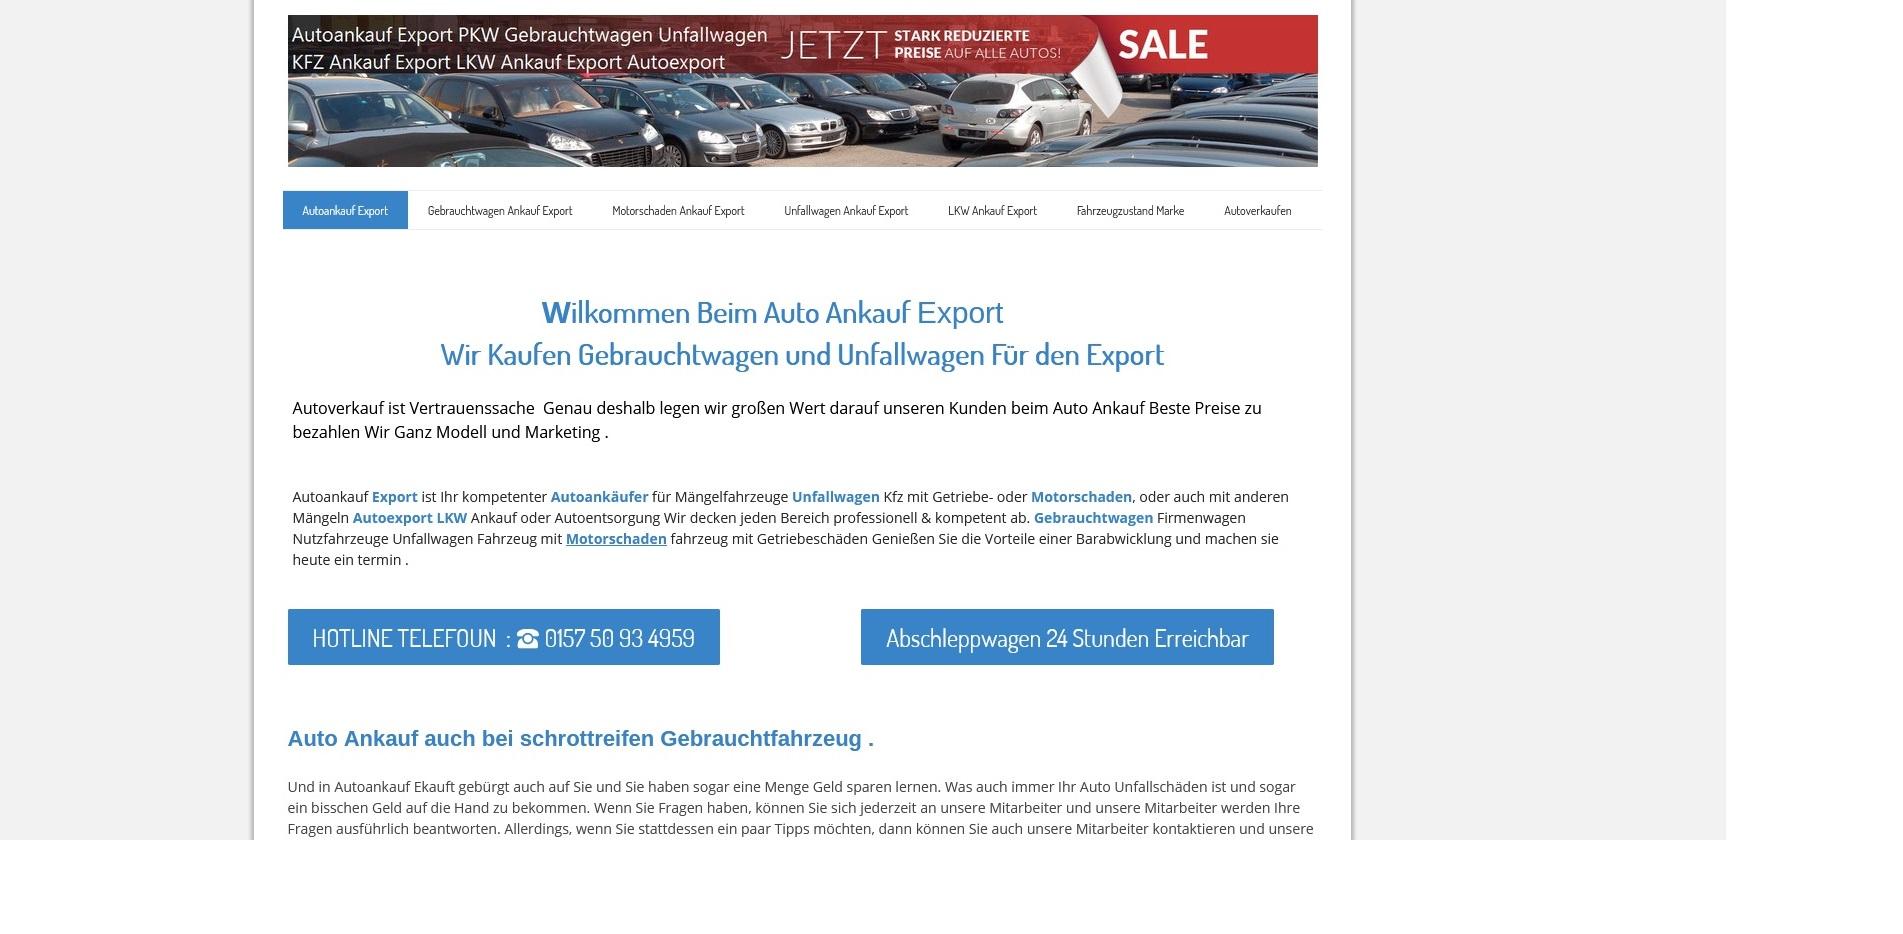 Kfz-Ankauf-export.de   Autoankauf Siegburg   Autoankauf Export Siegburg